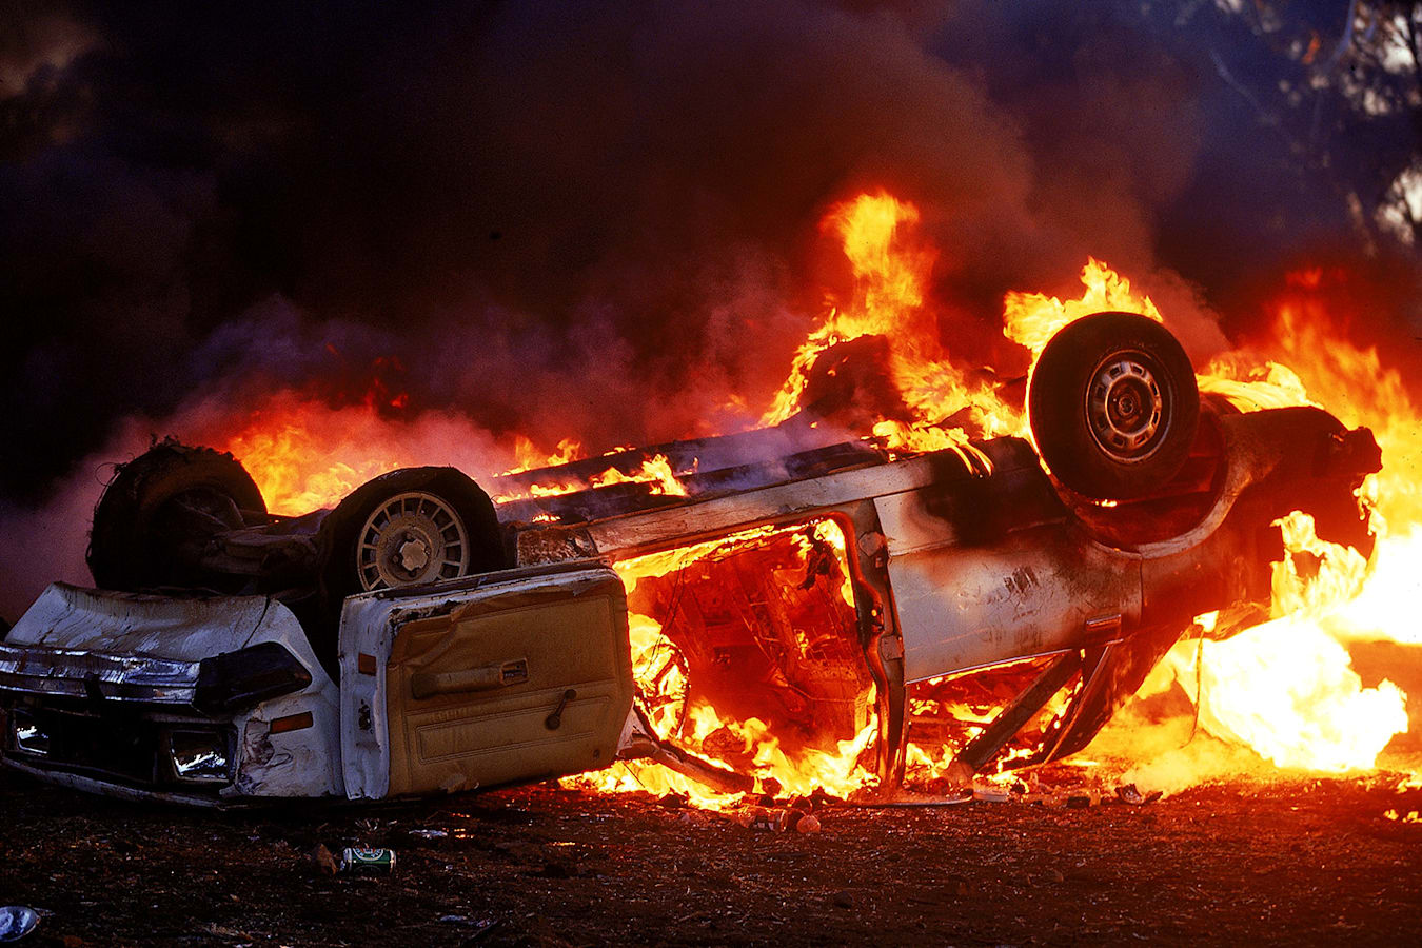 Bathurst Riots Burning Car Jpg